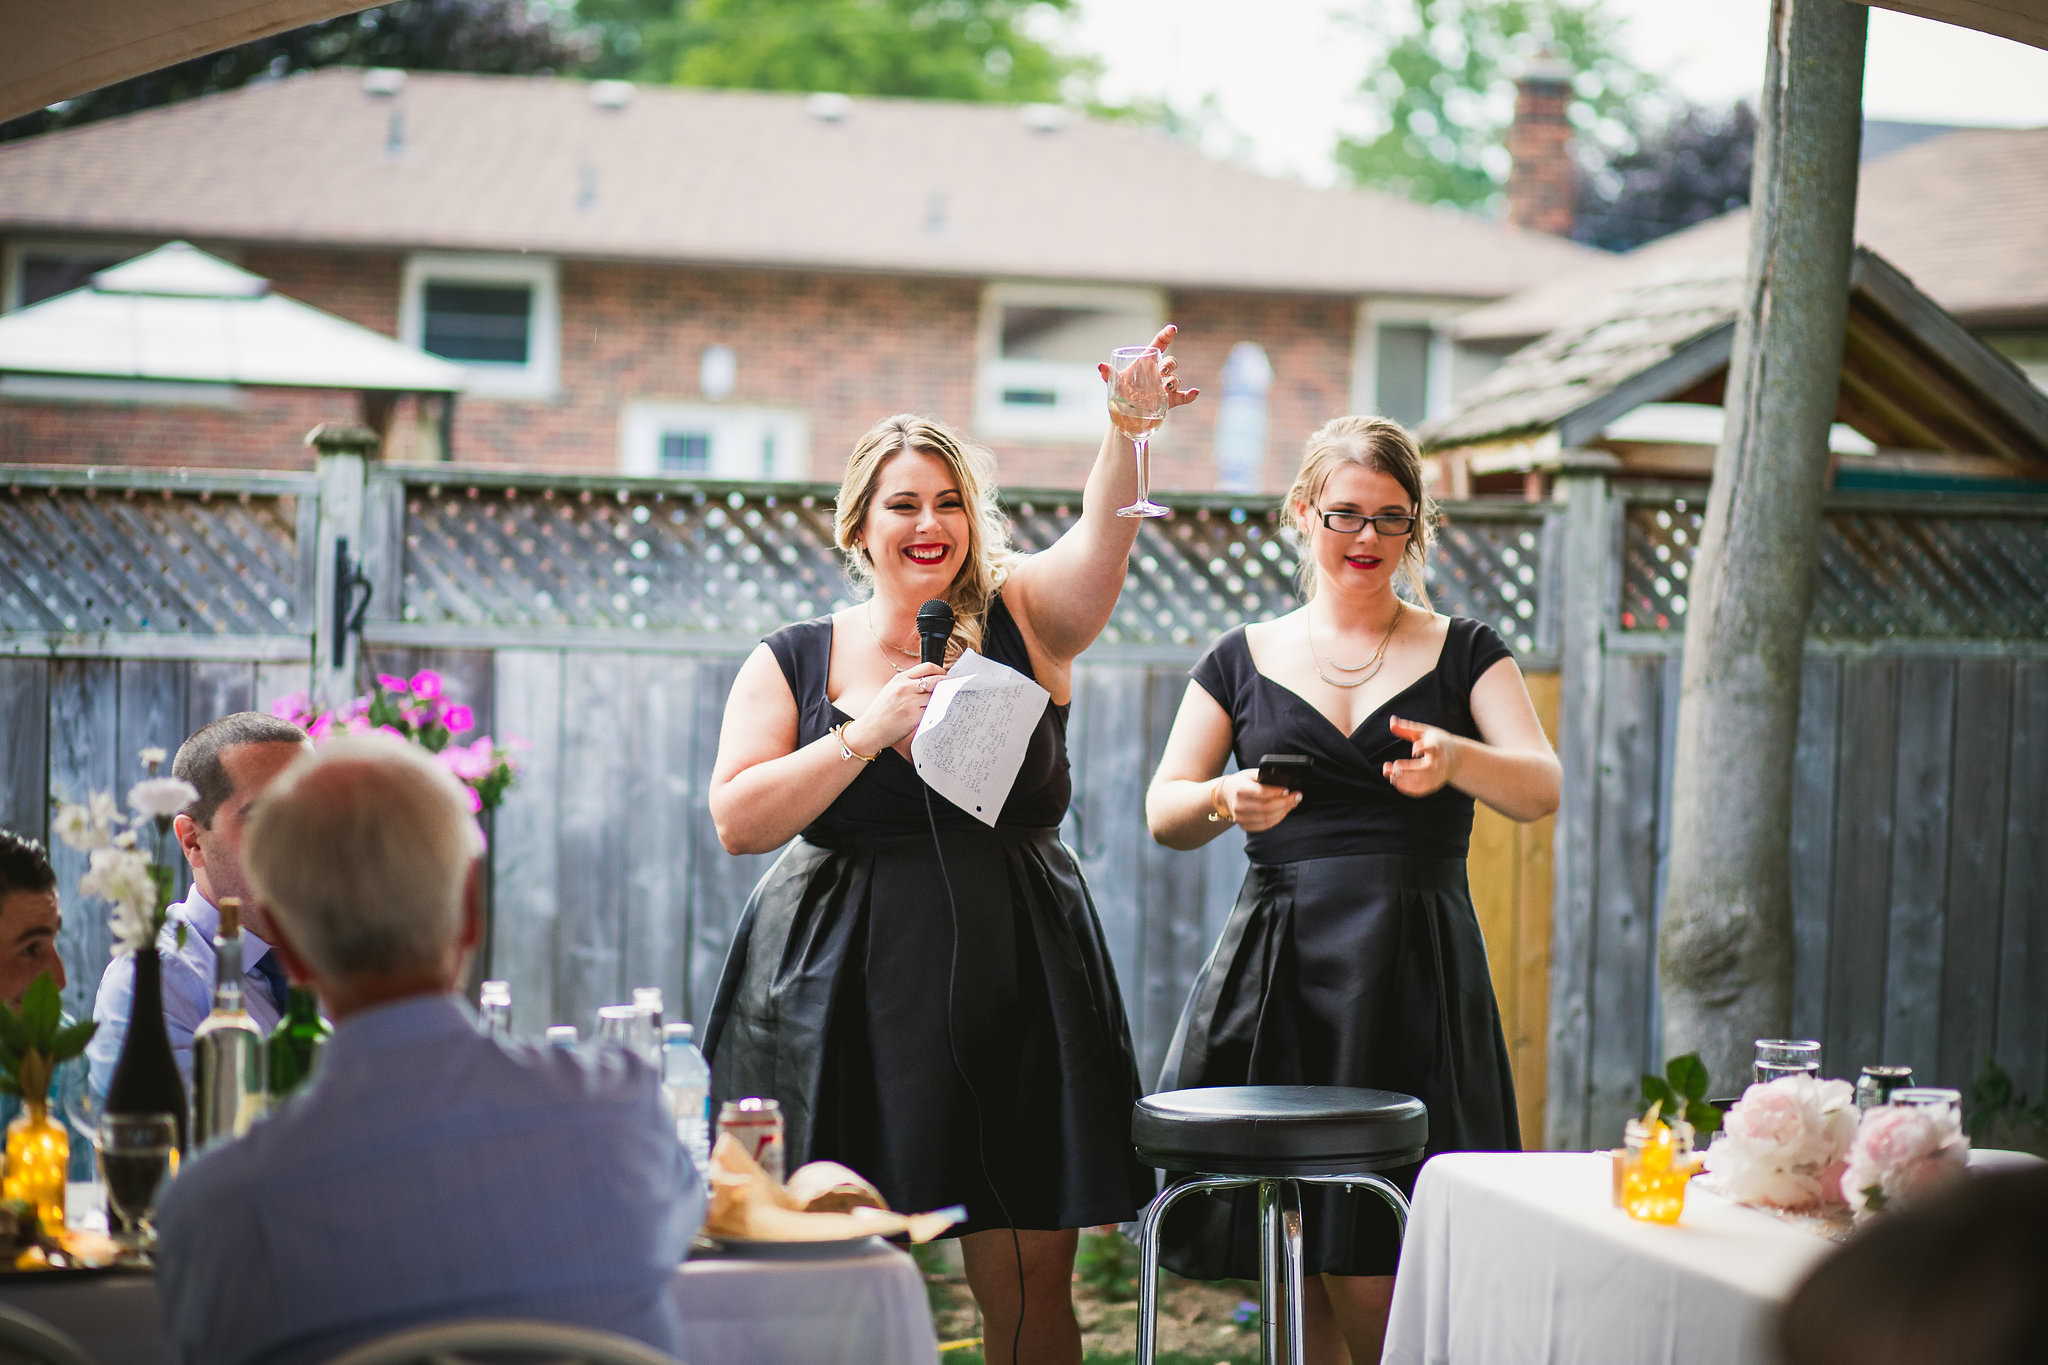 Kristen Adam Kindred Loft Whitby Wedding Photos 512 - Durham Wedding Photographer: Kindred Loft Wedding Photos